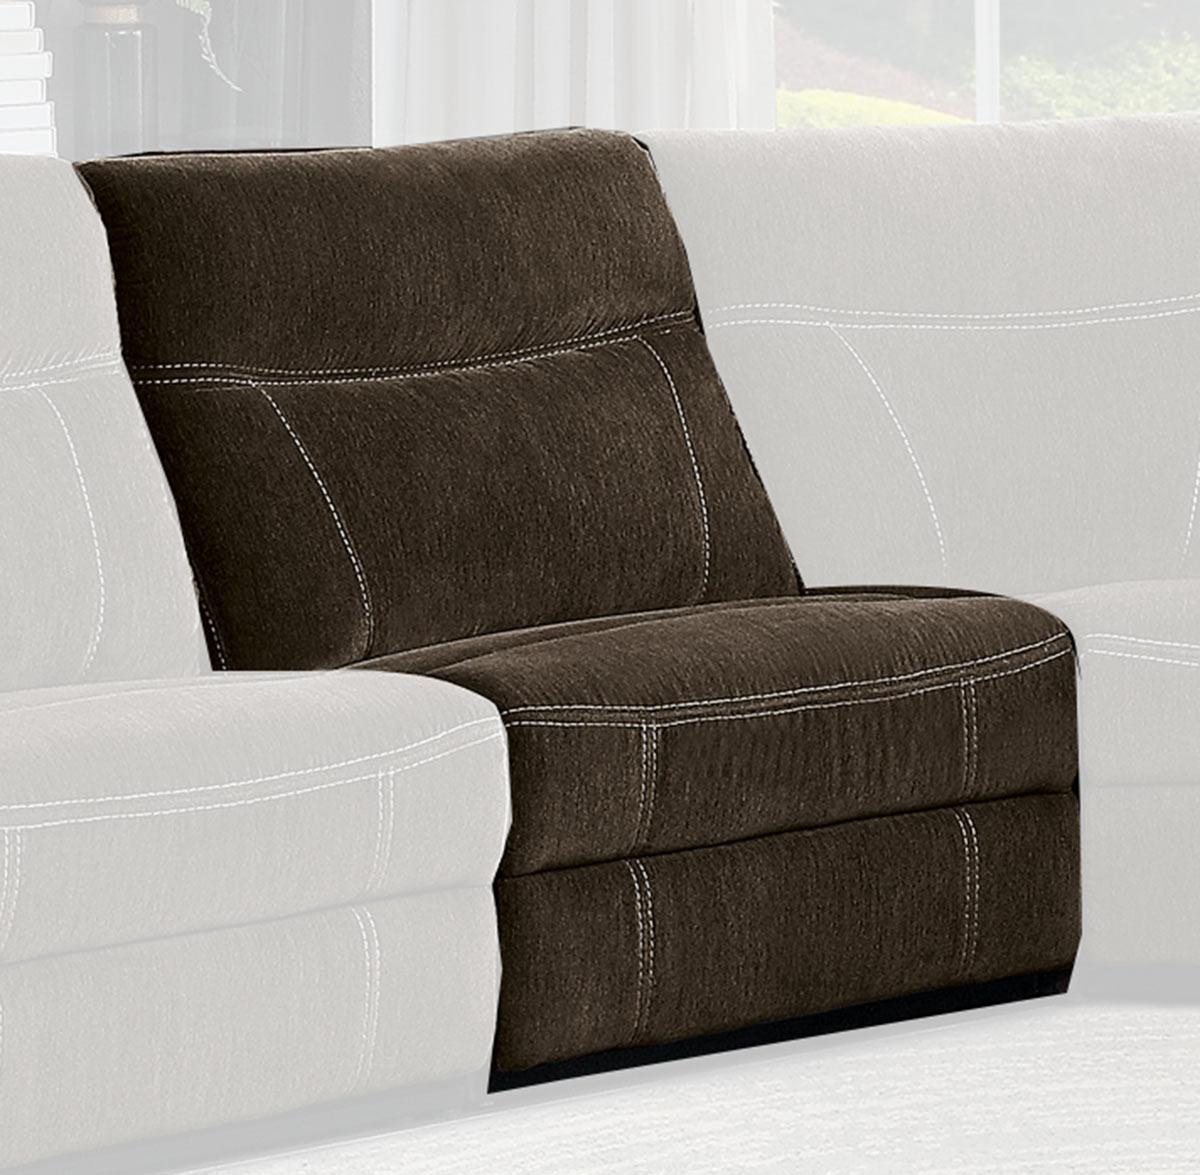 Homelegance Annabelle Armless Chair - Brown